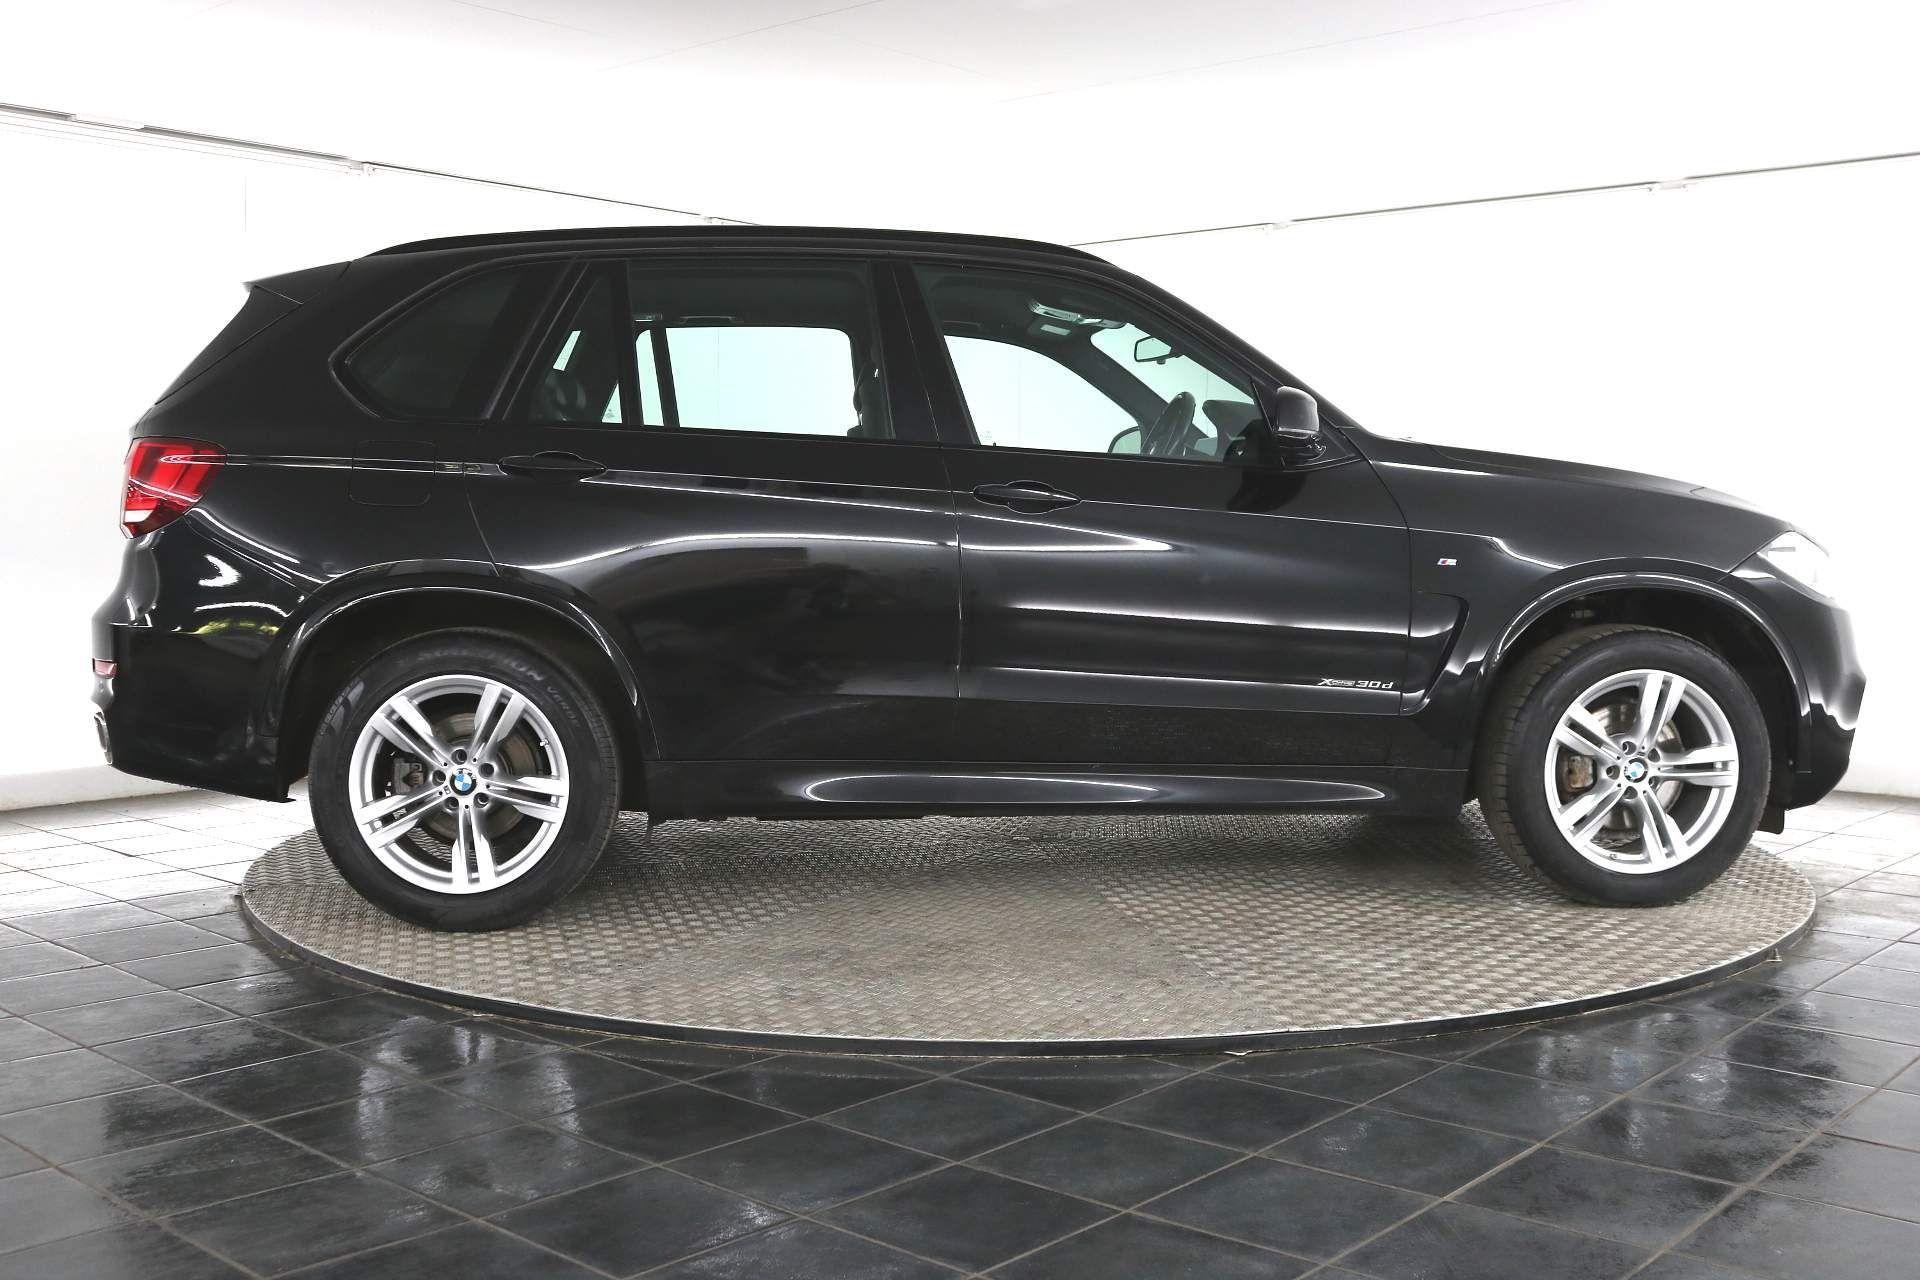 "BMW X5 3.0d xDrive""Auto"" Special Equipment - 15 Reg - 7 Seater -Leather - Sat Nav -Mega Spec- No Vat"